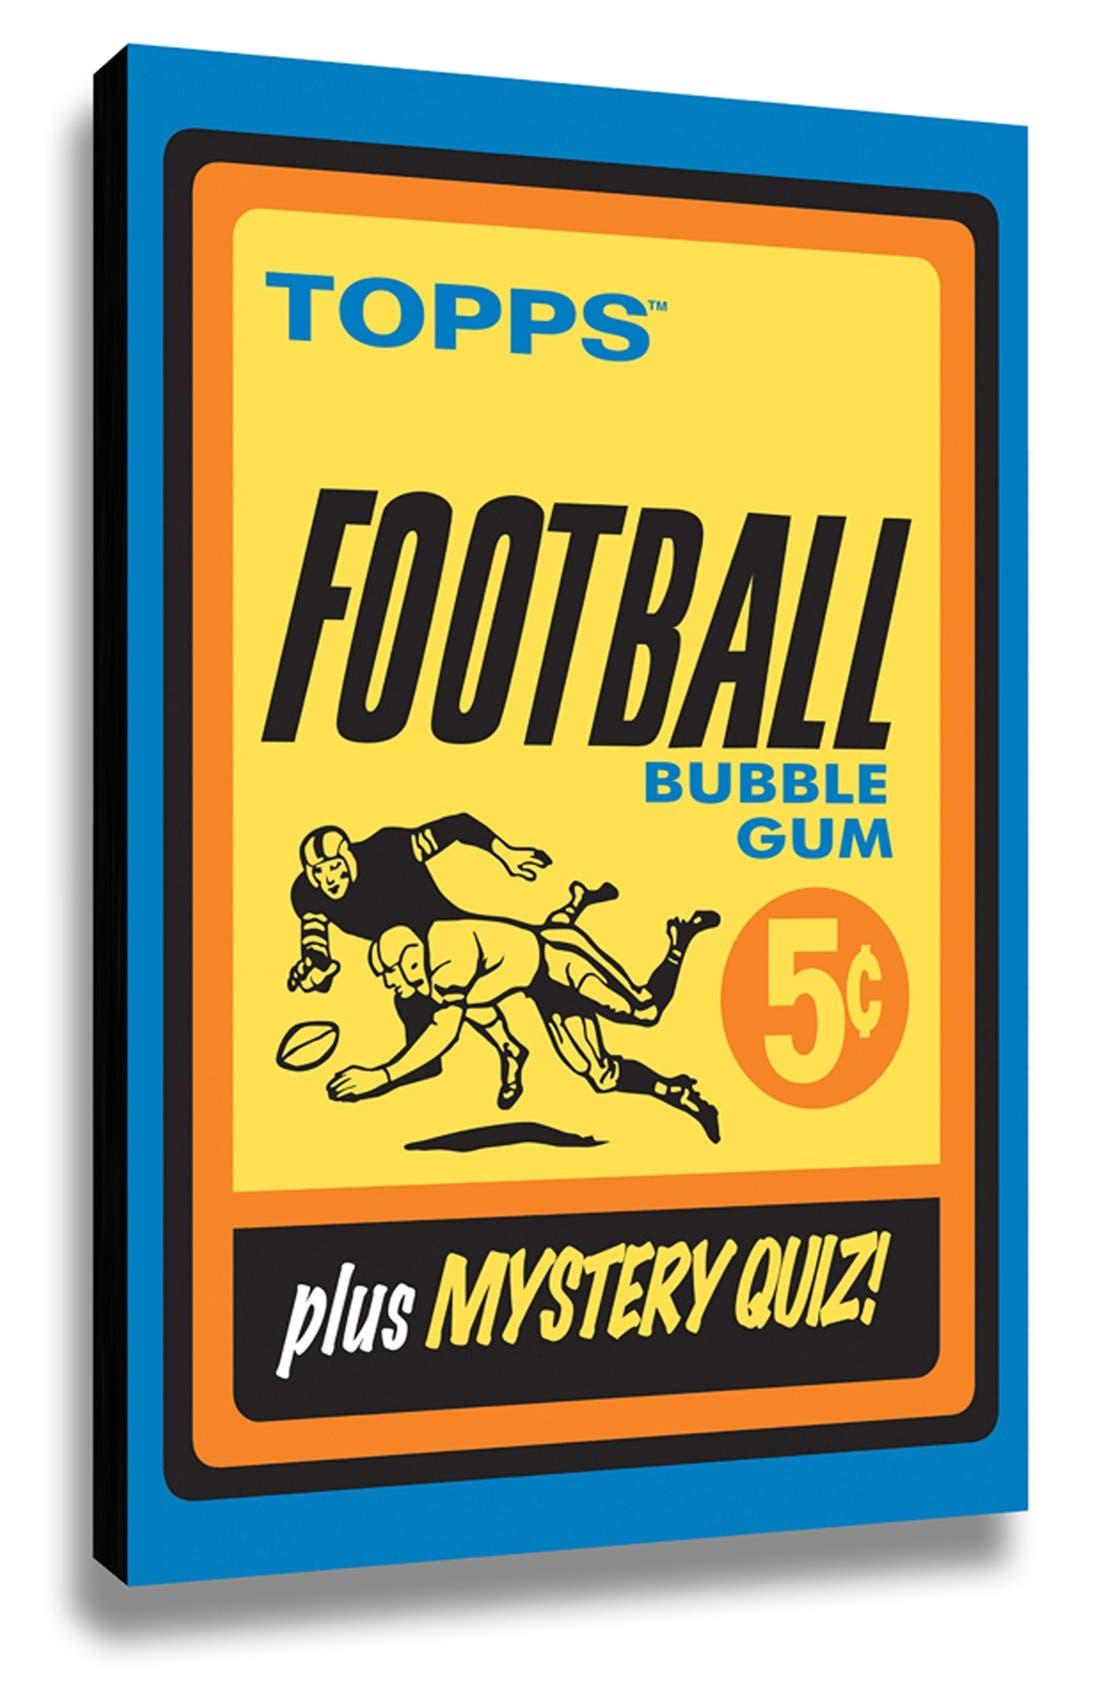 LAMP-IN-A-BOX 'Topps Football 1963 Bubblegum Wrapper' Wall Art